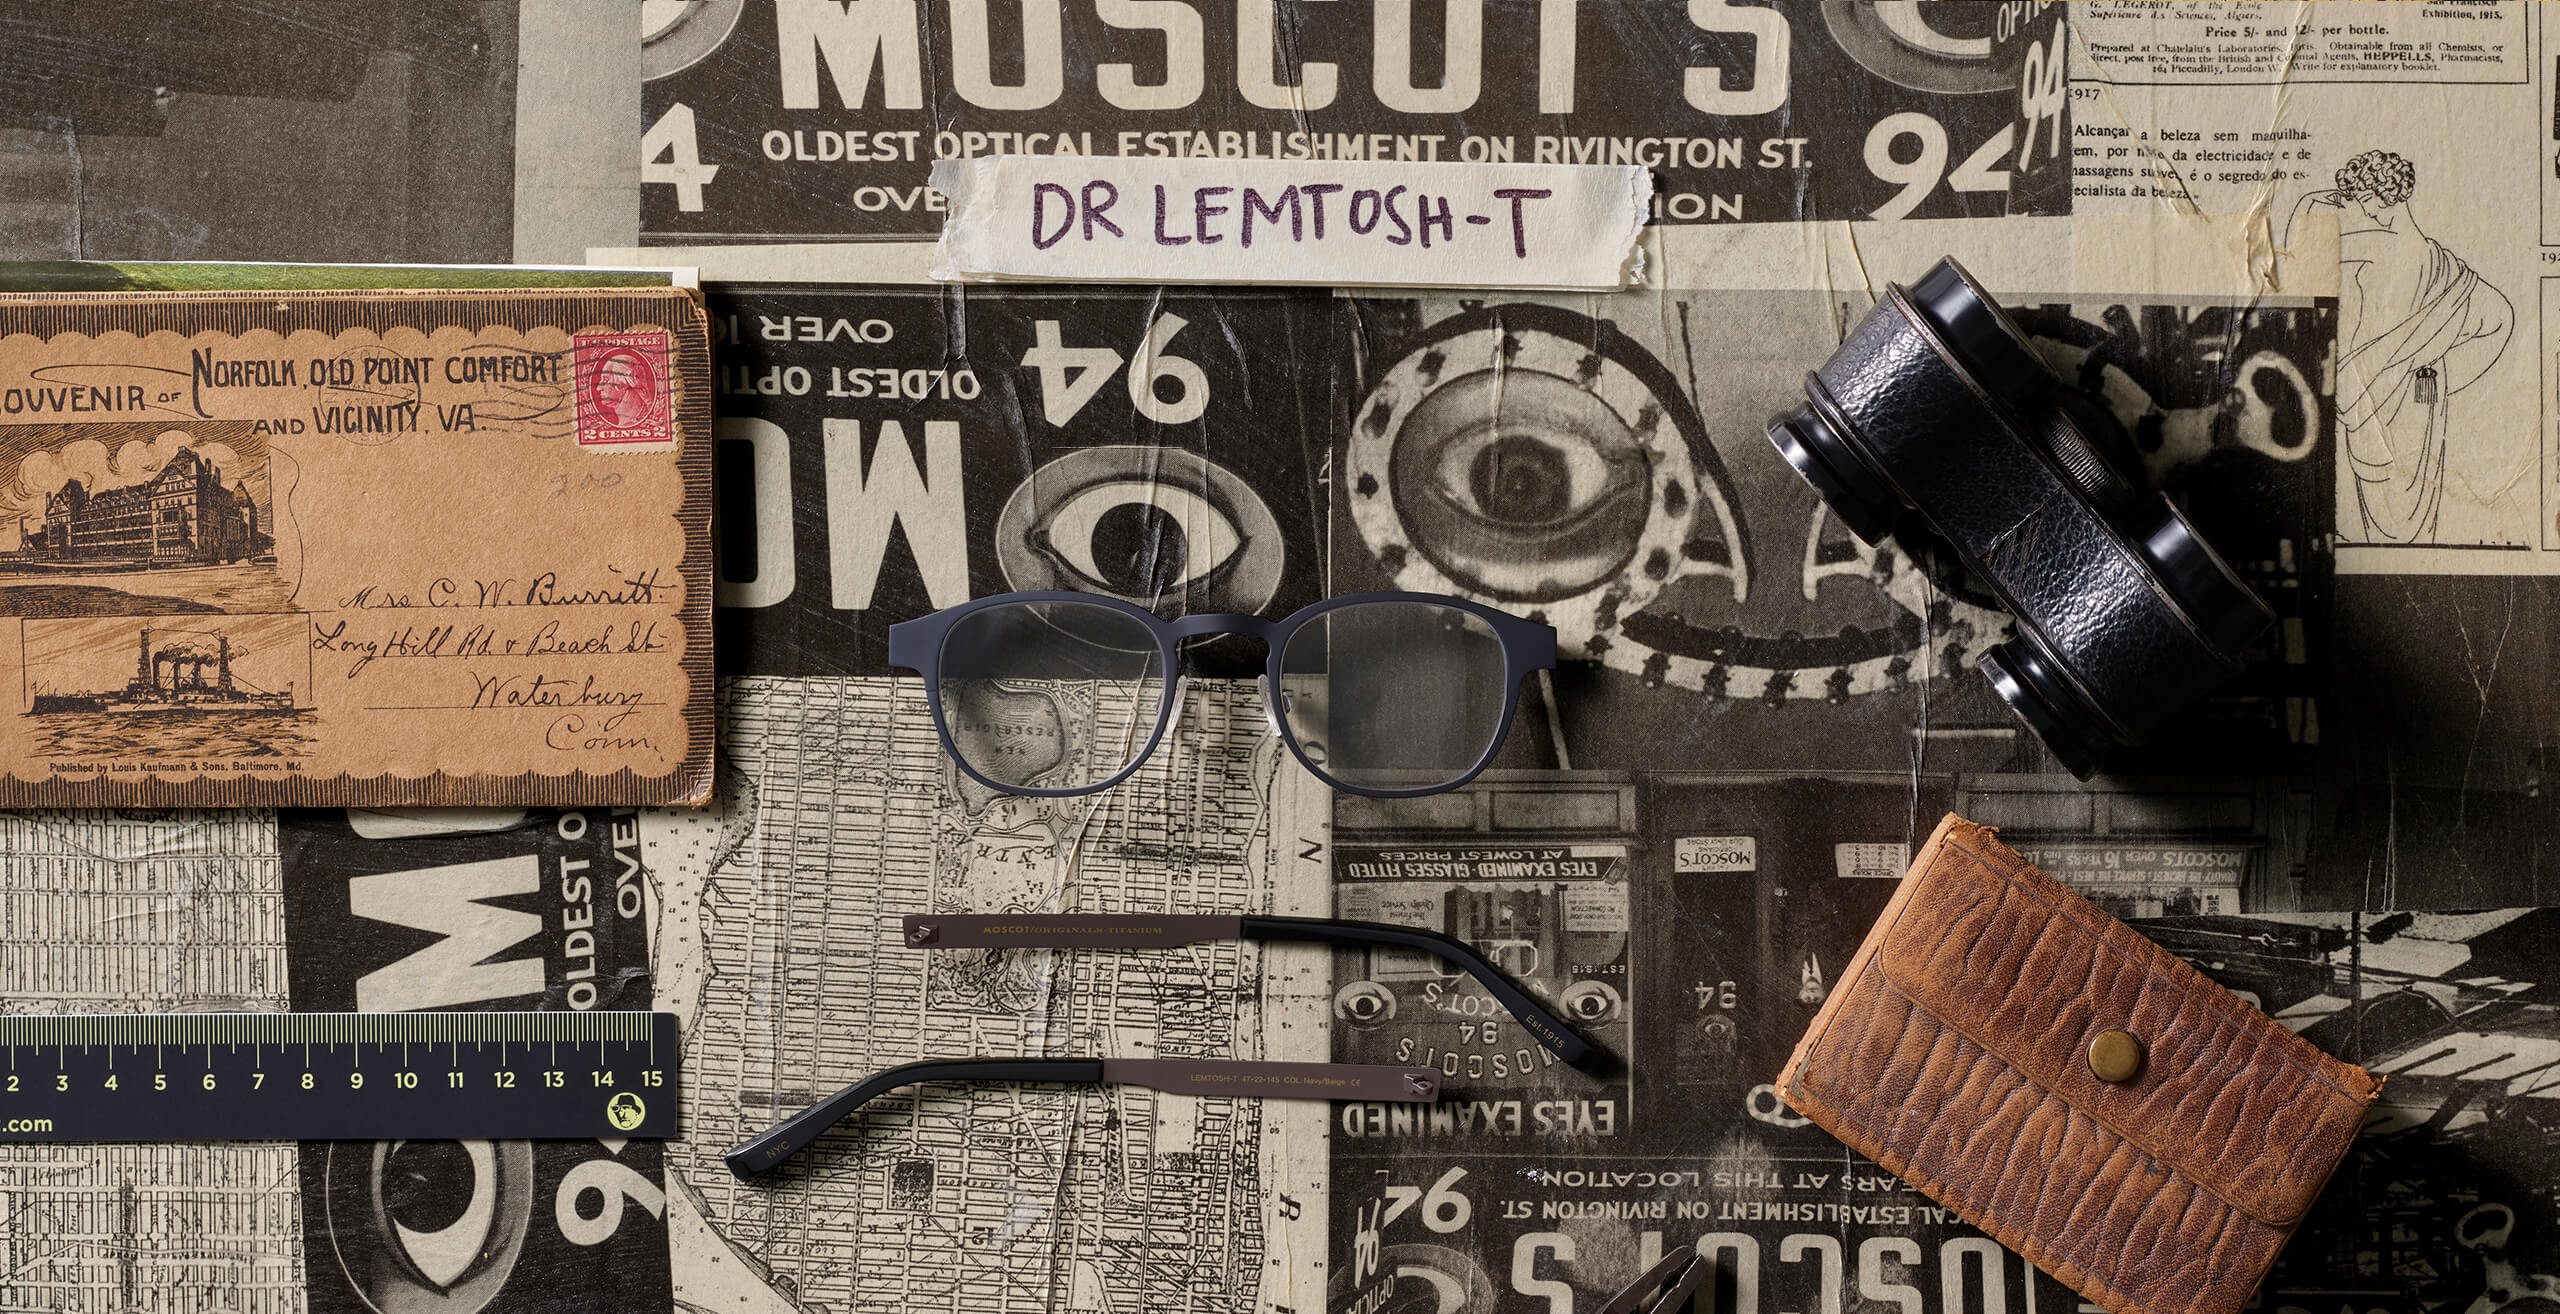 Disassembled DR LEMTOSH-T frame in Navy/Beige